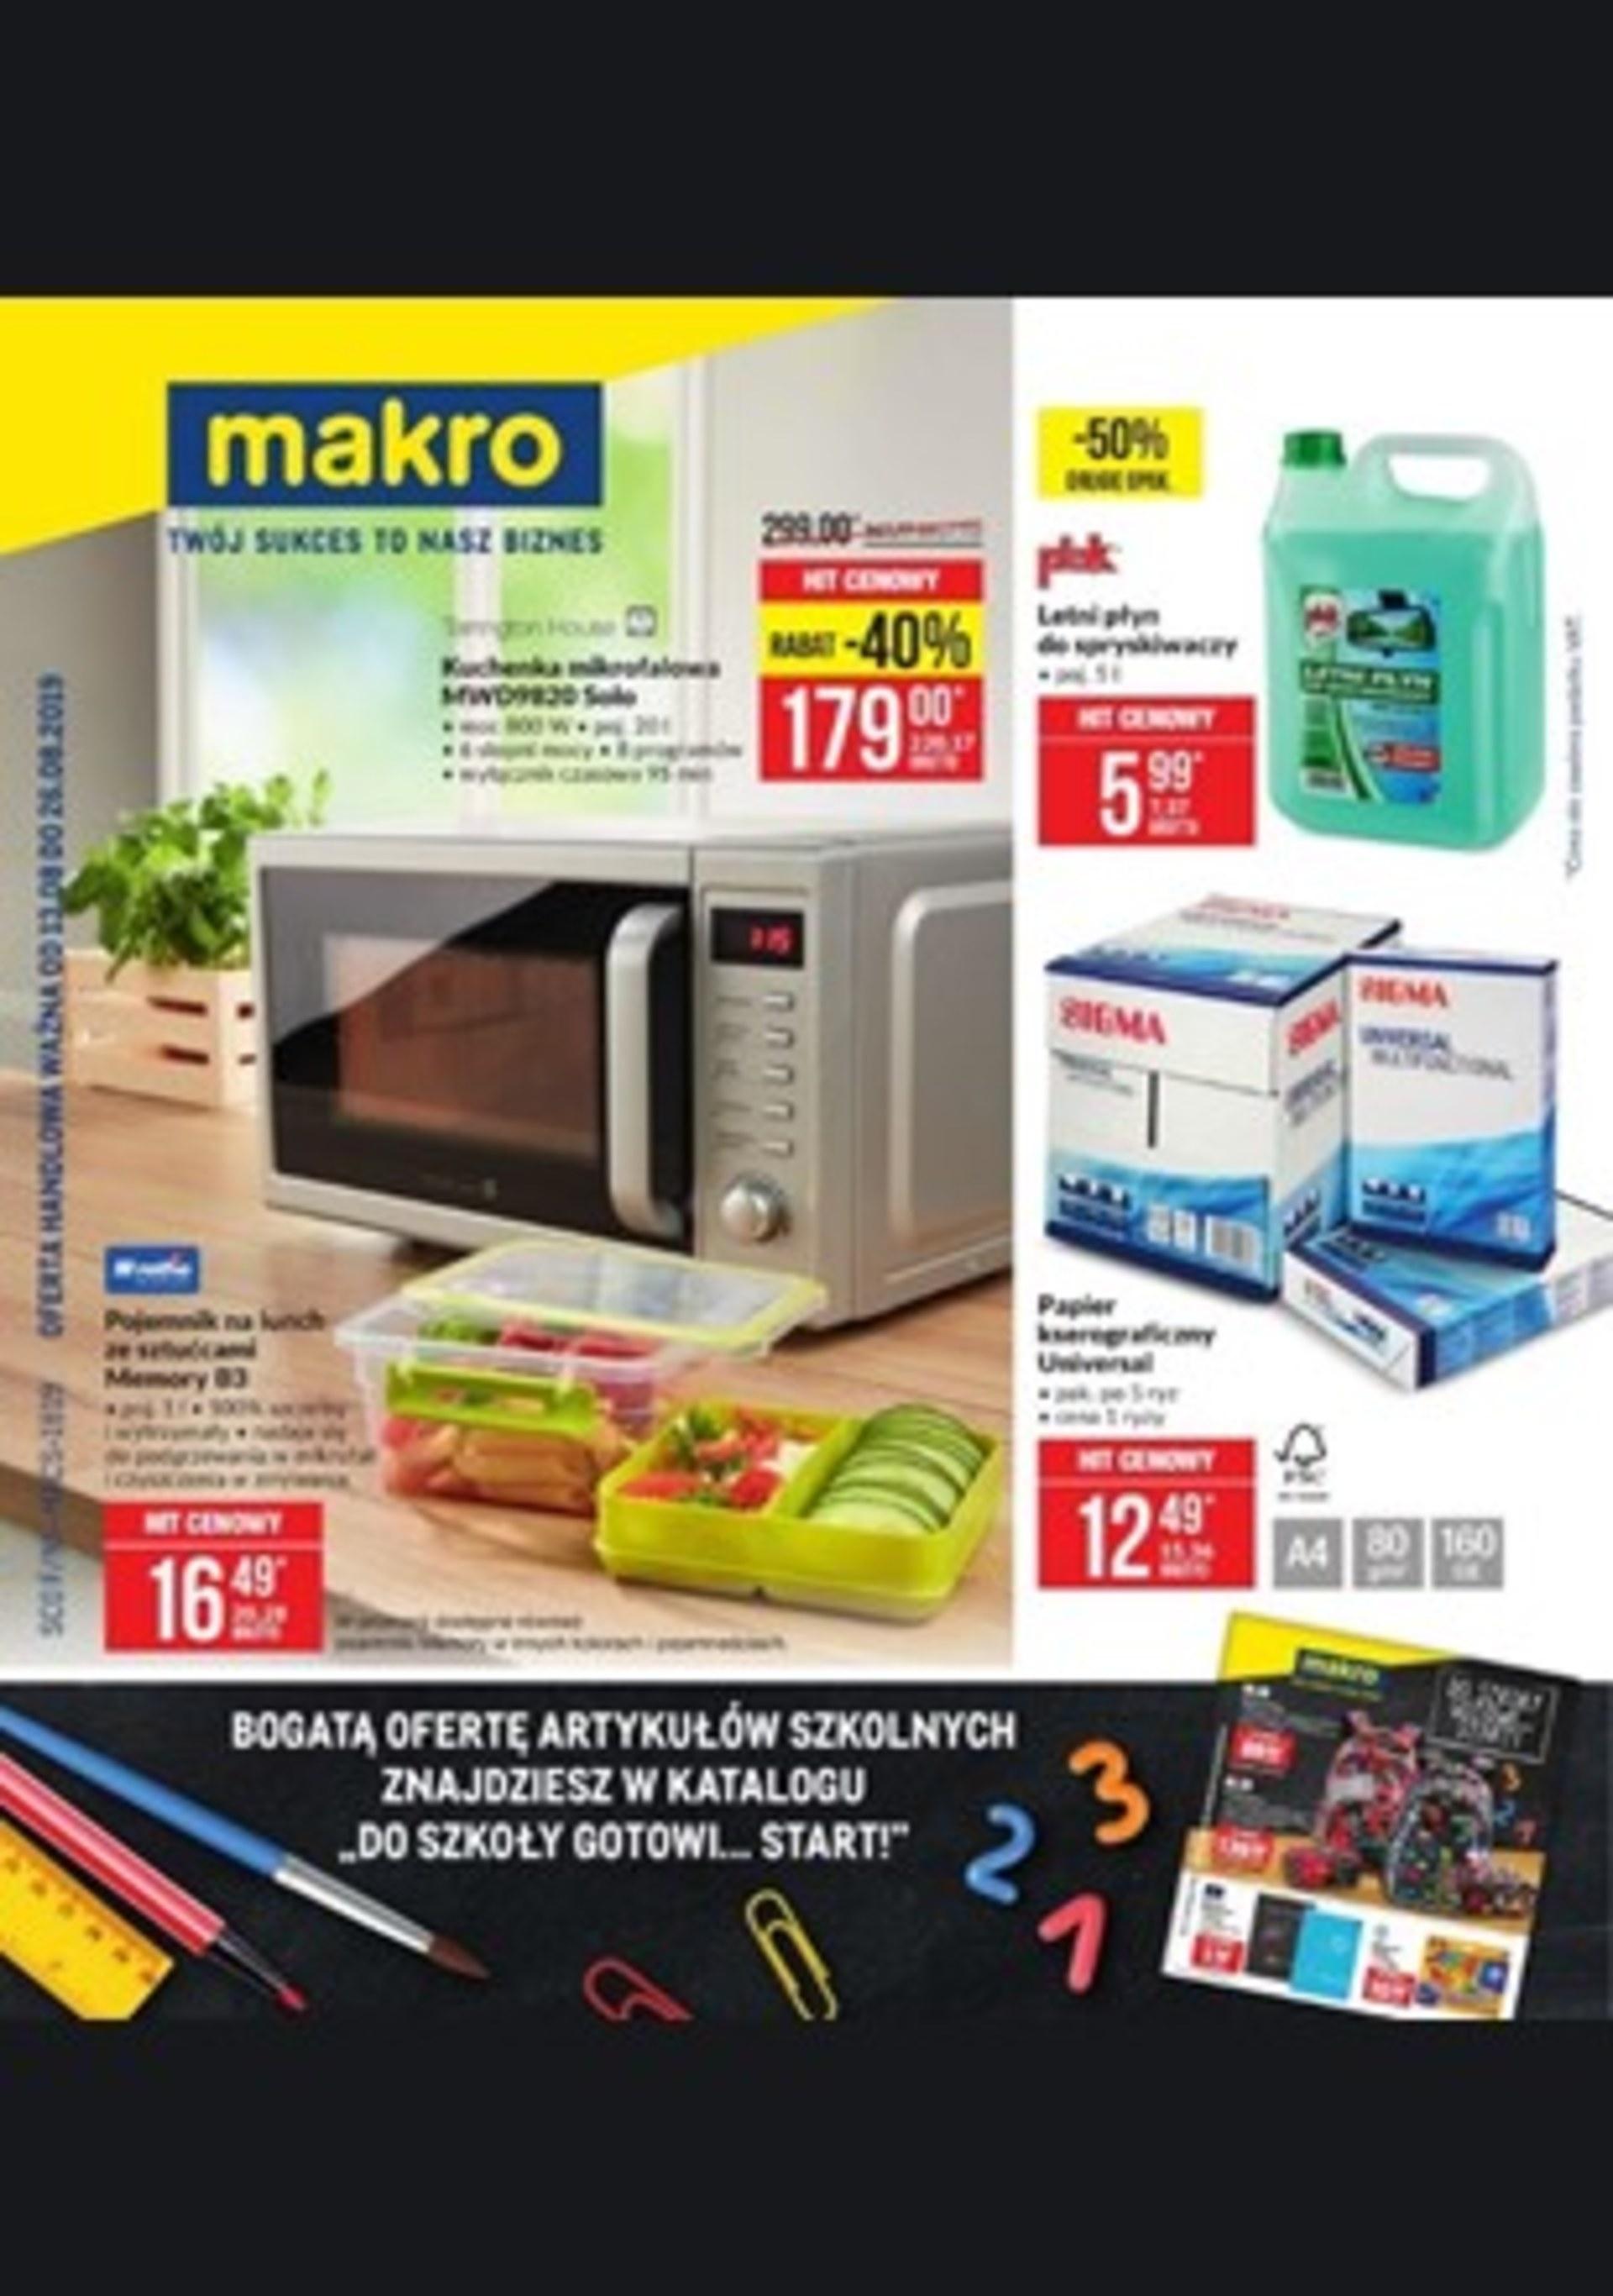 Gazetka promocyjna Makro Cash&Carry • Okazjum.pl • s.3 • 41906